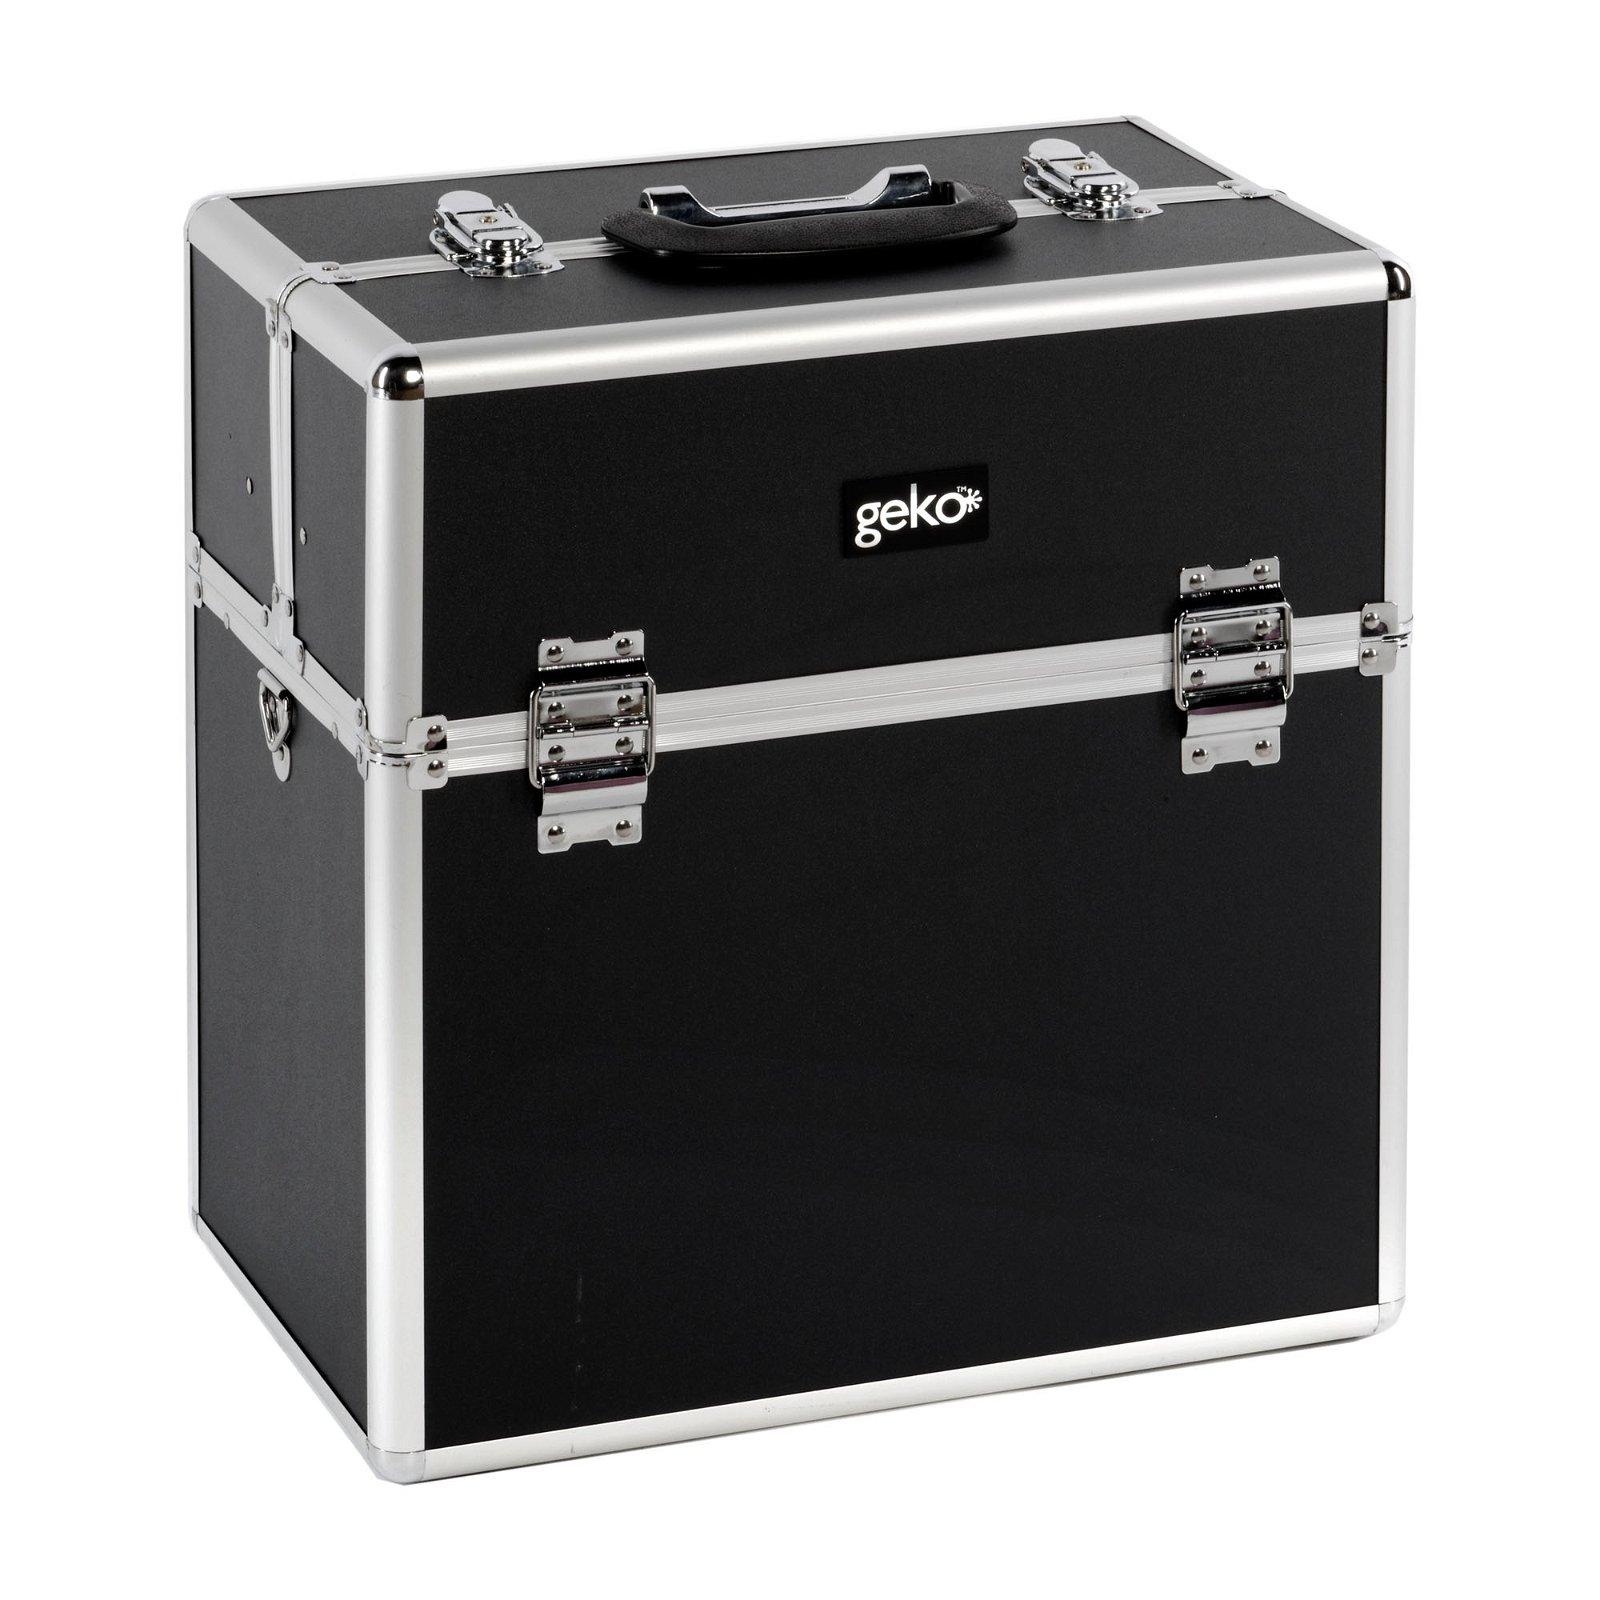 Vanity Case / Makeup Box Box Black